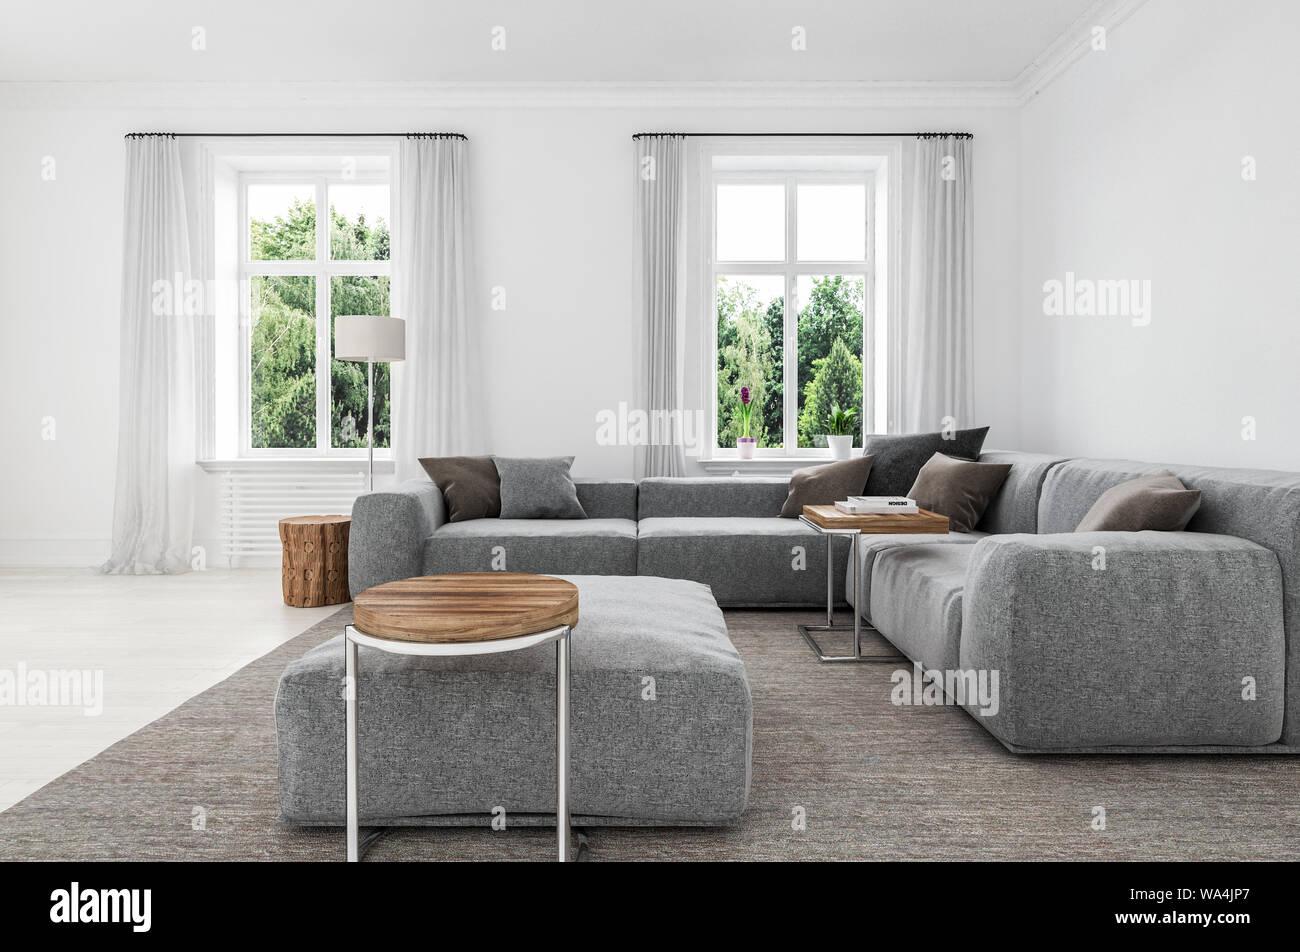 Comfortable Minimalist Sitting Room Interior With